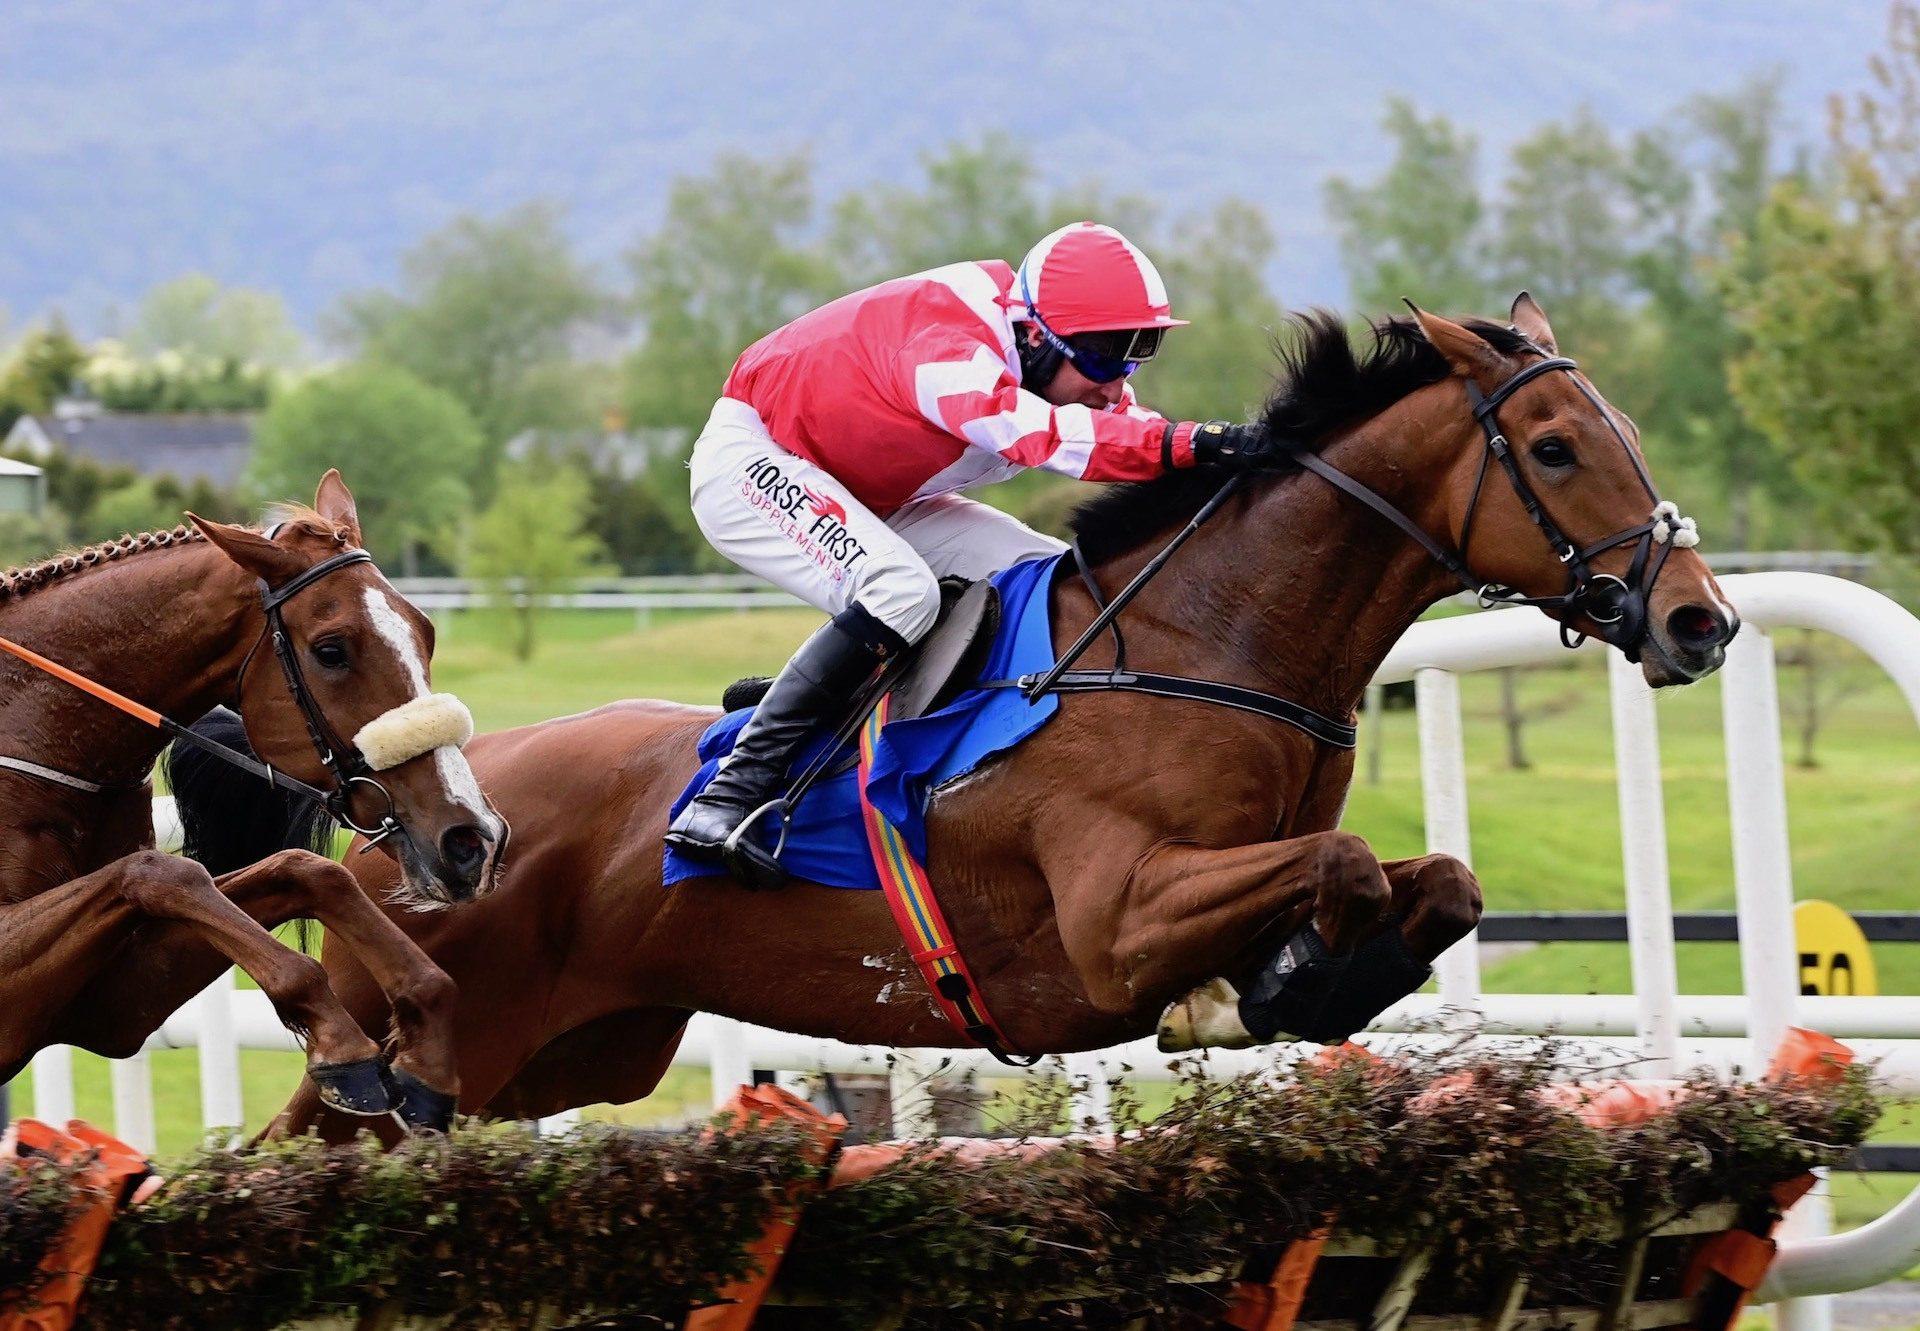 Edison Kent (Leading Light) Wins The Maiden Hurdle At Killarney